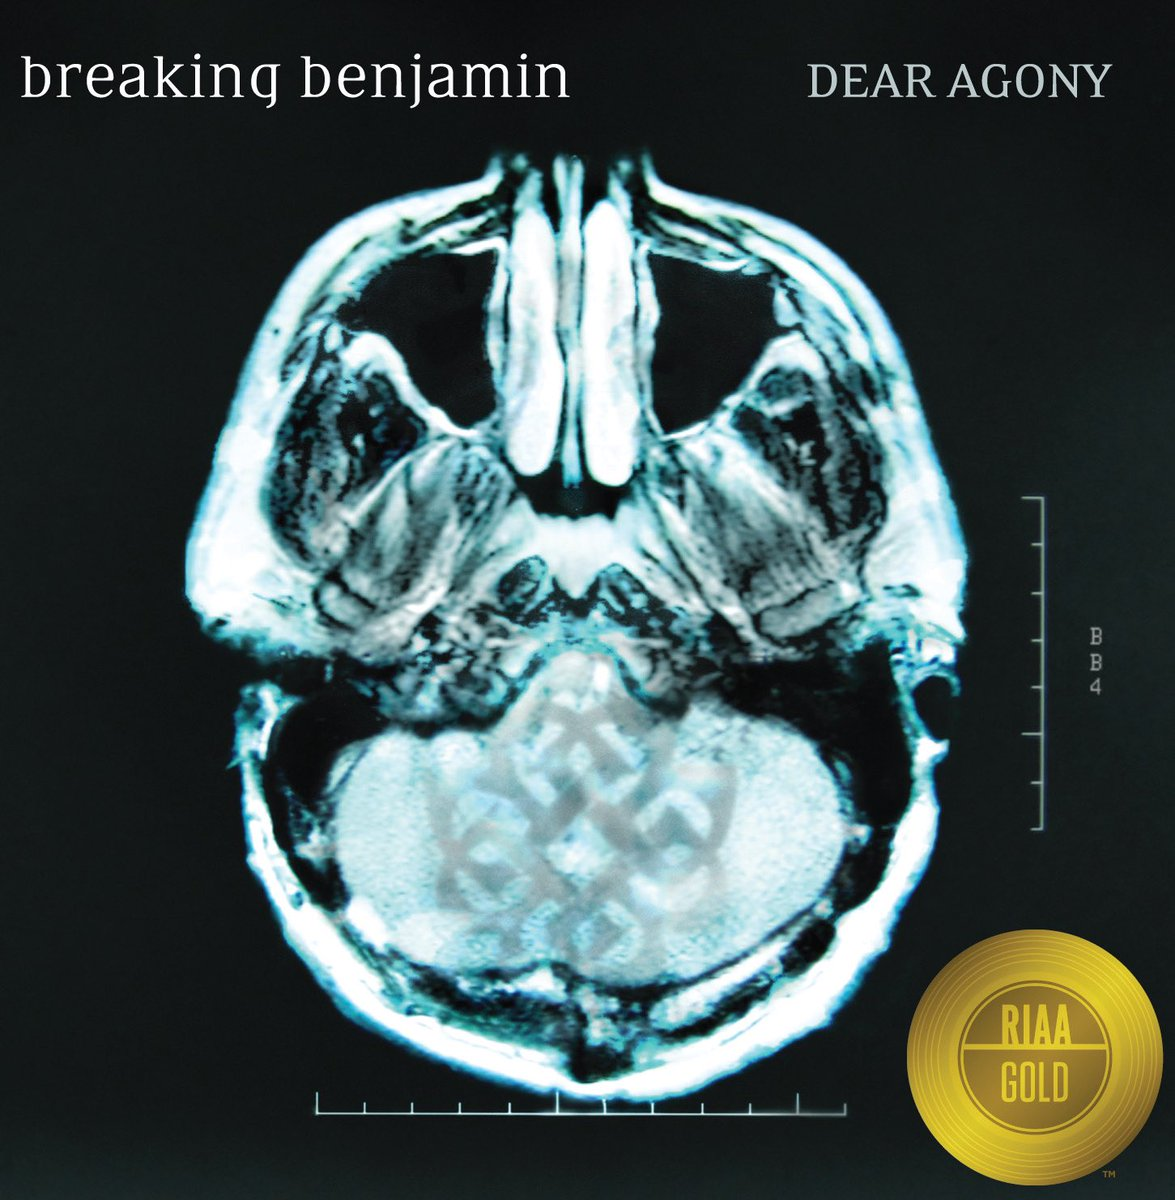 GOLD CERTIFIED. 📀 @breakingbenj's Dear Agony is now @RIAA Gold! Listen here: hollywoodrecs.co/DearAgony